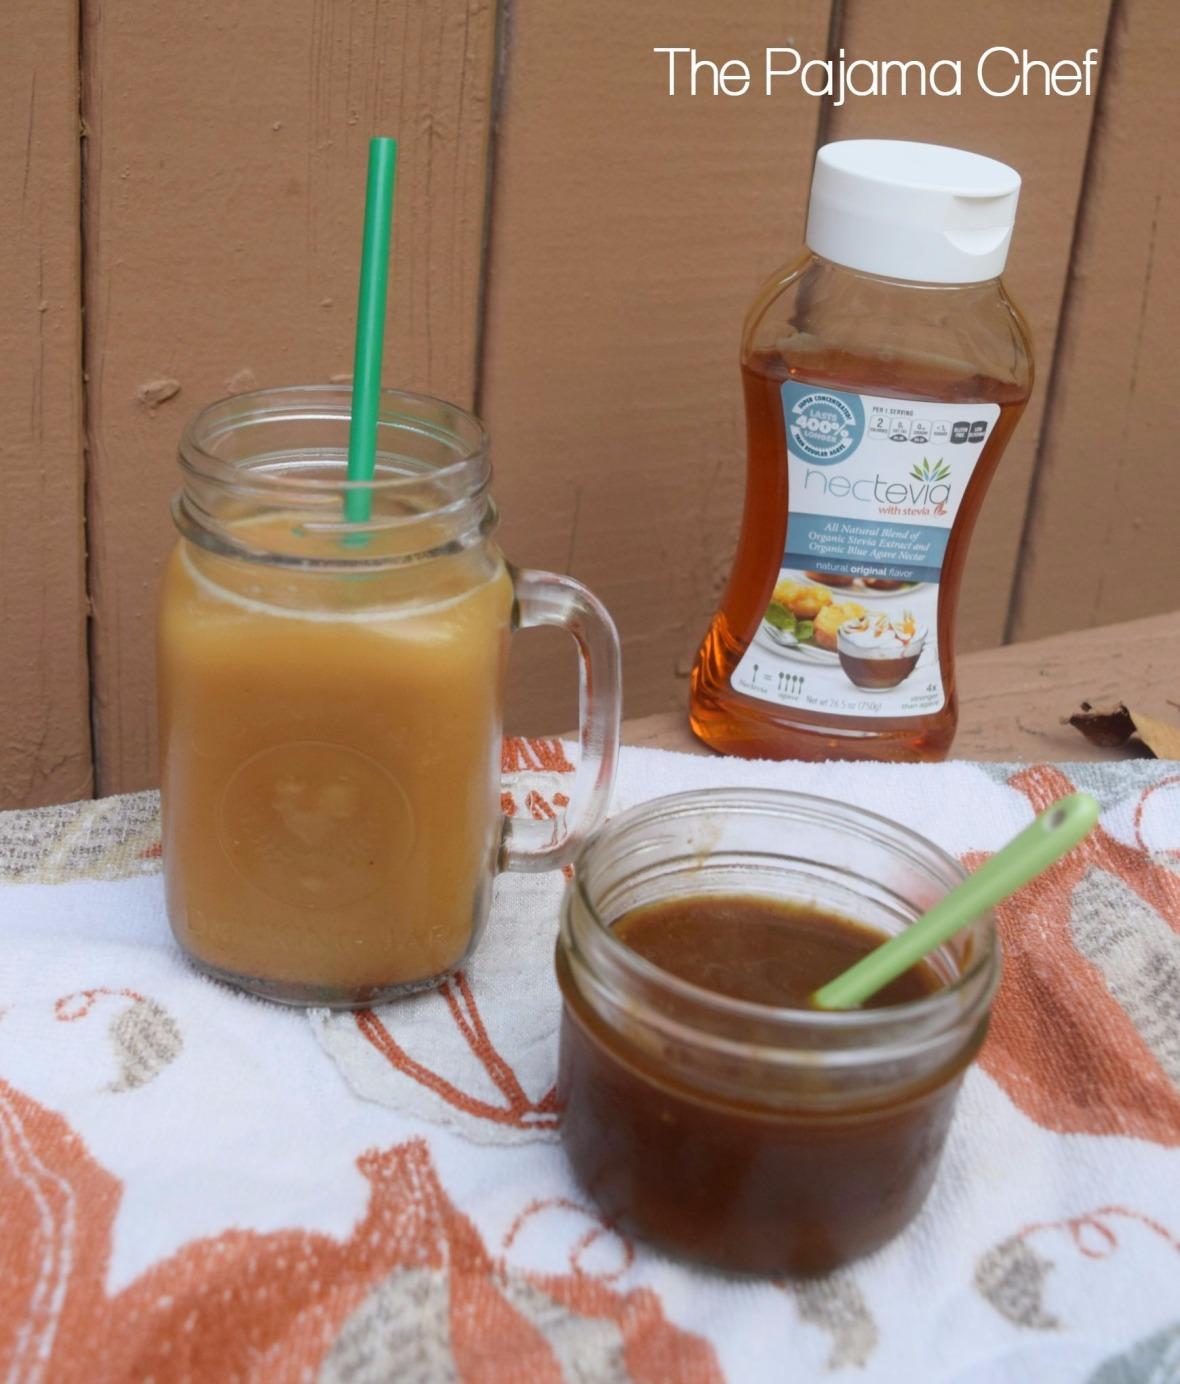 Pumpkin Spice Coffee Syrup + Cold Brew Coffee Method #steviva #sweetandeasy | thepajamachef.com